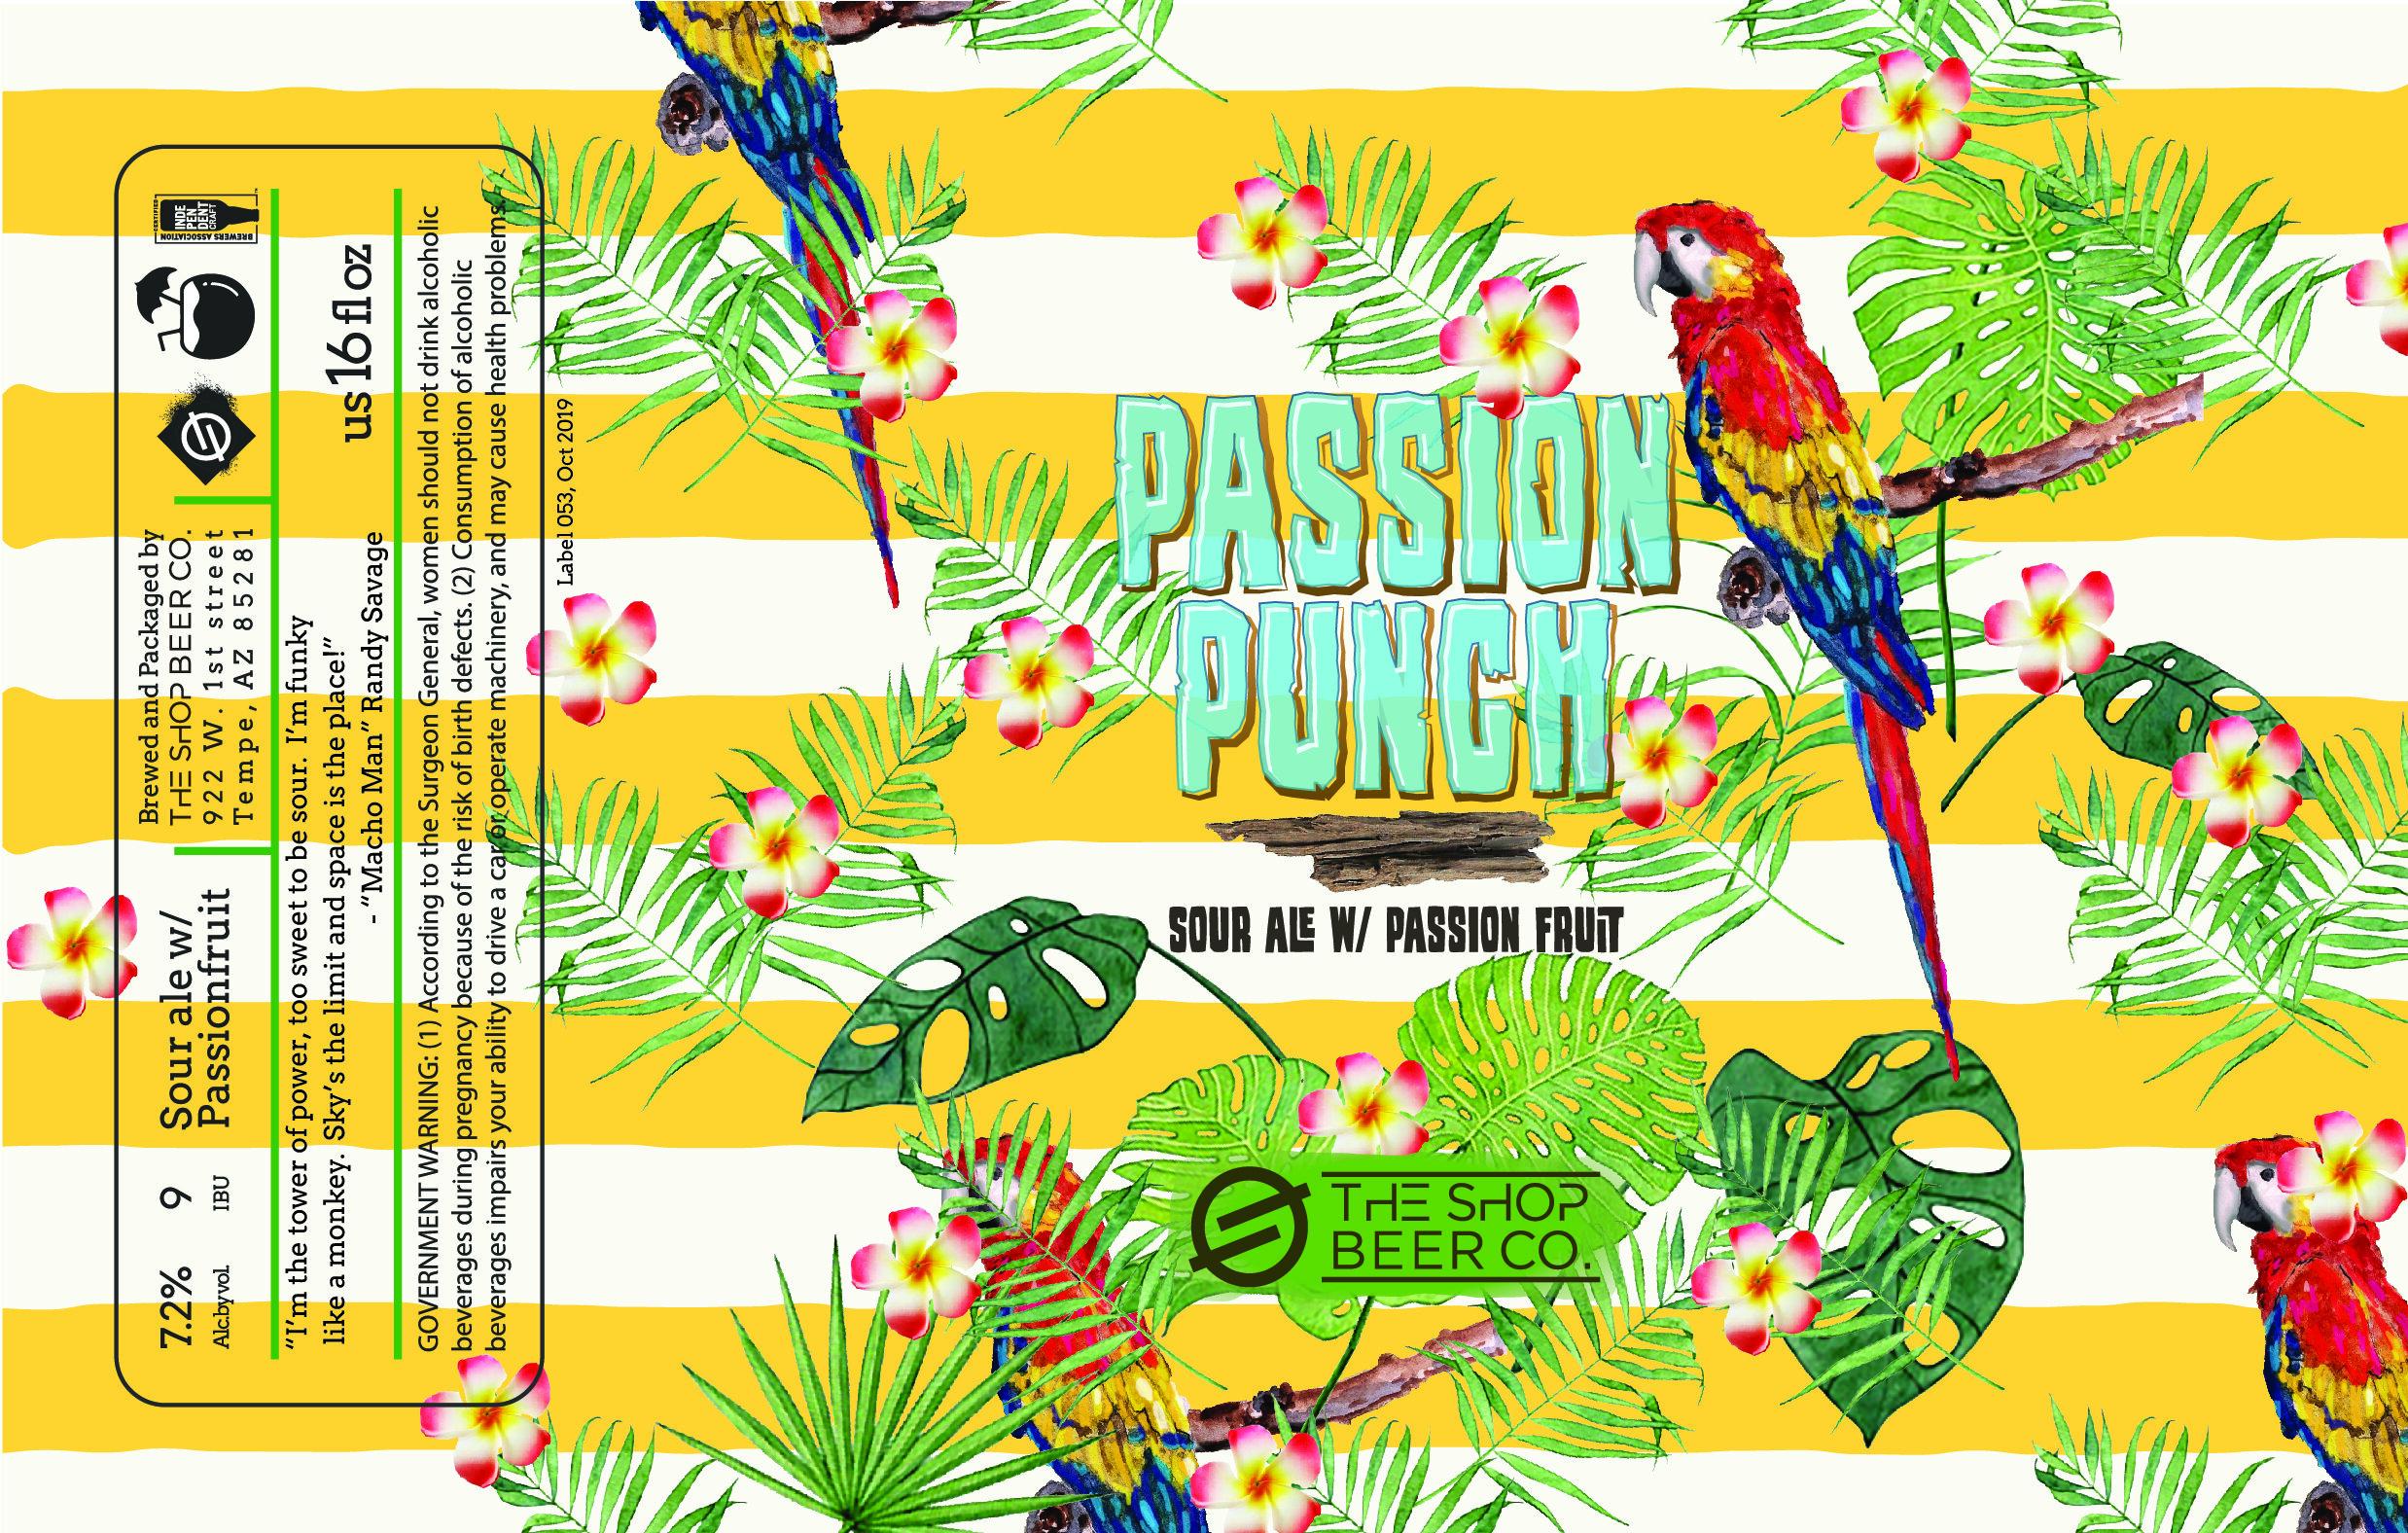 Passion Punch_Website_label.jpg